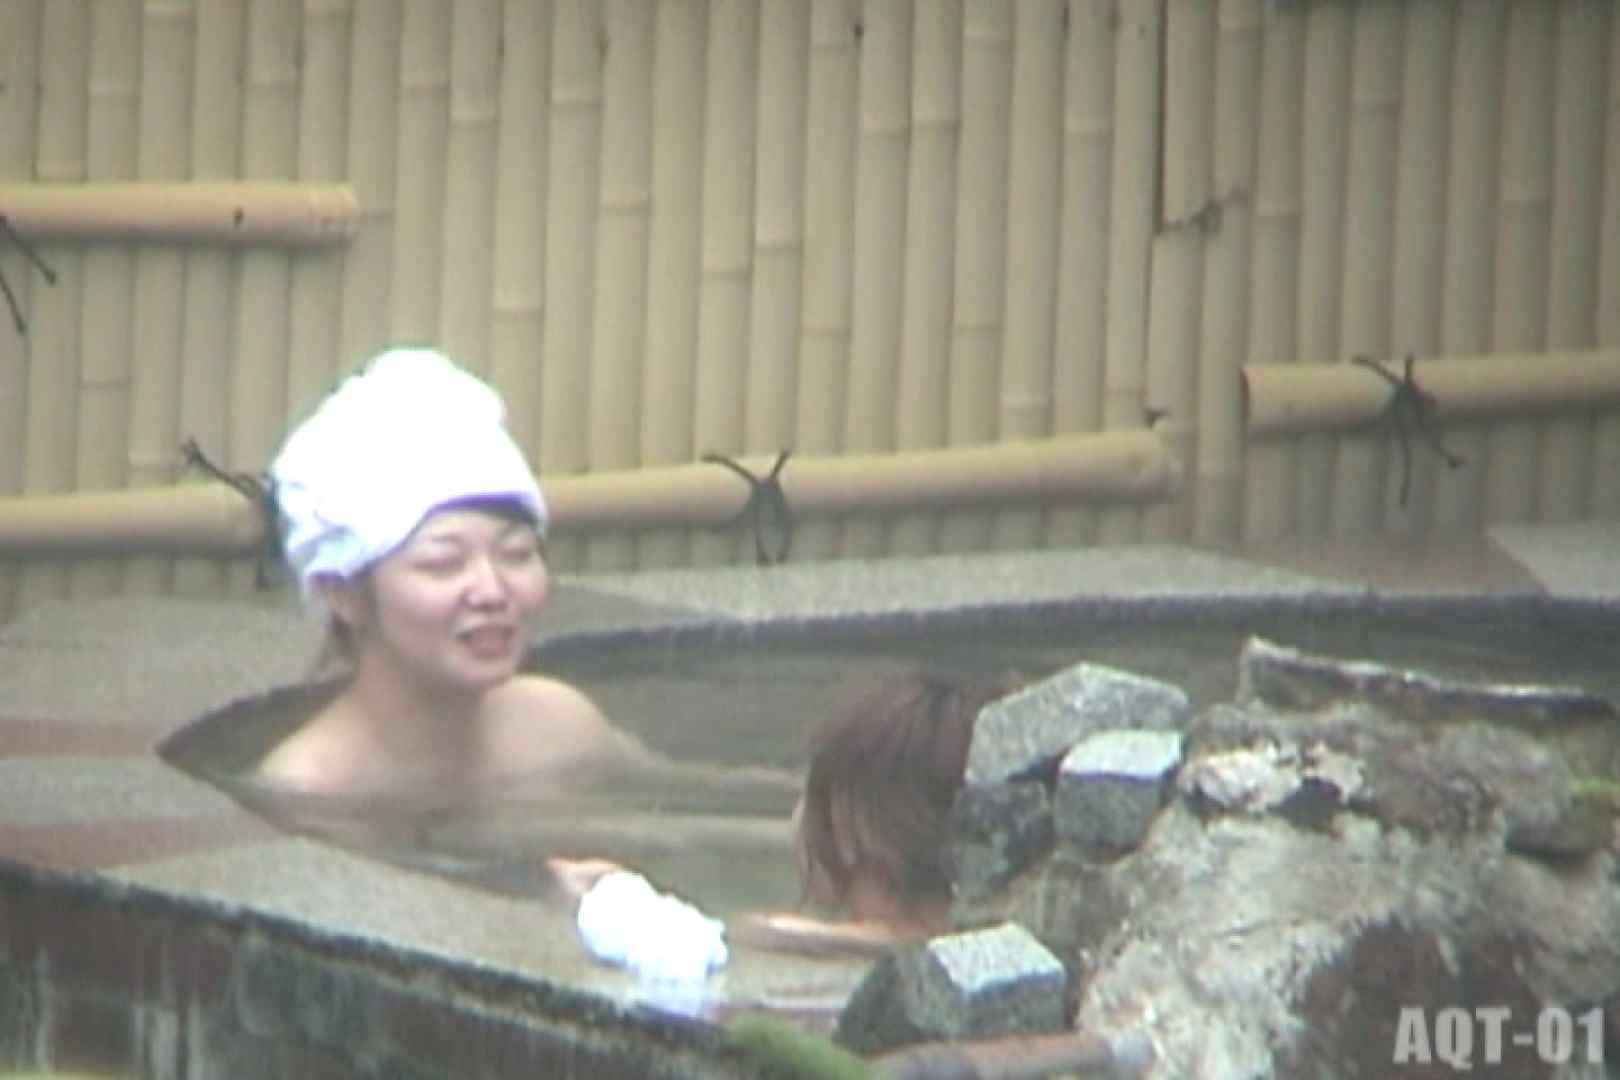 Aquaな露天風呂Vol.715 OLセックス 覗きおまんこ画像 77画像 2